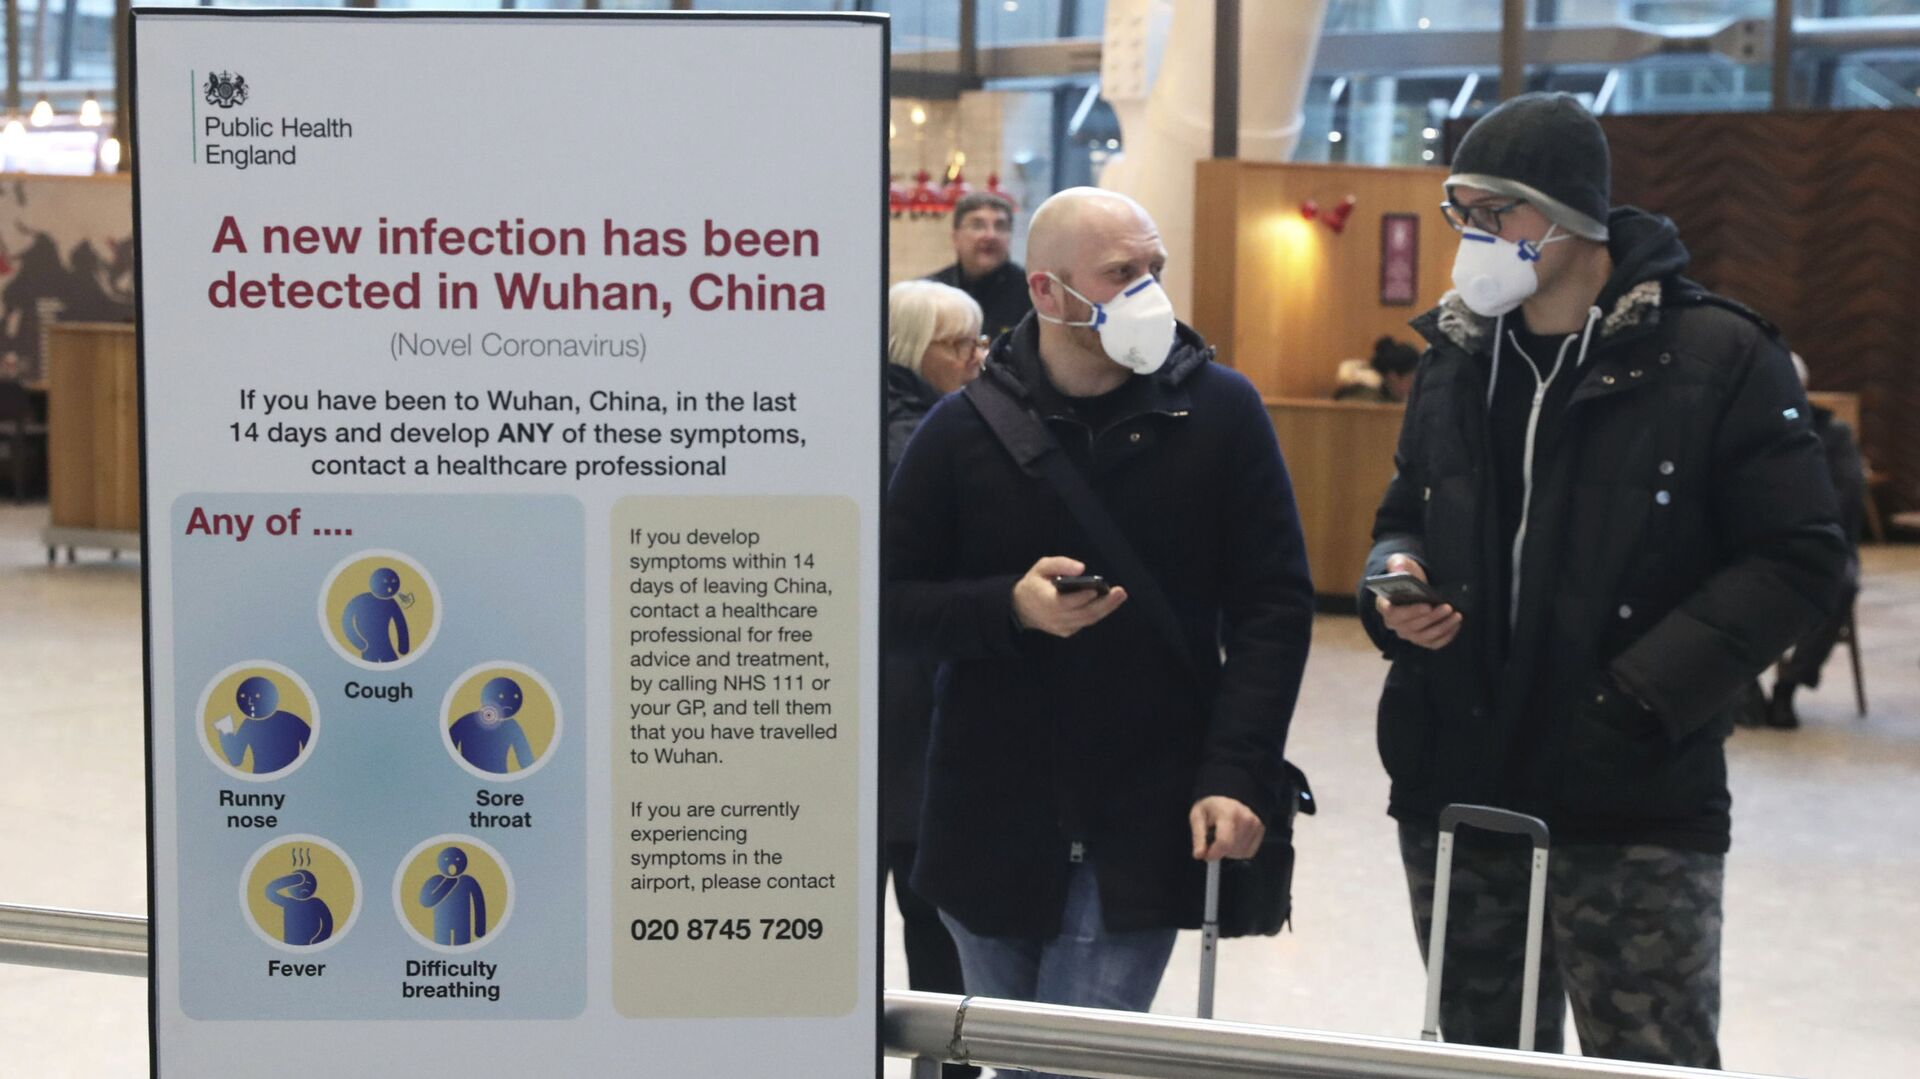 Turisti con mascherine all'aeroporto Heathrow di Londra - Sputnik Italia, 1920, 23.07.2021